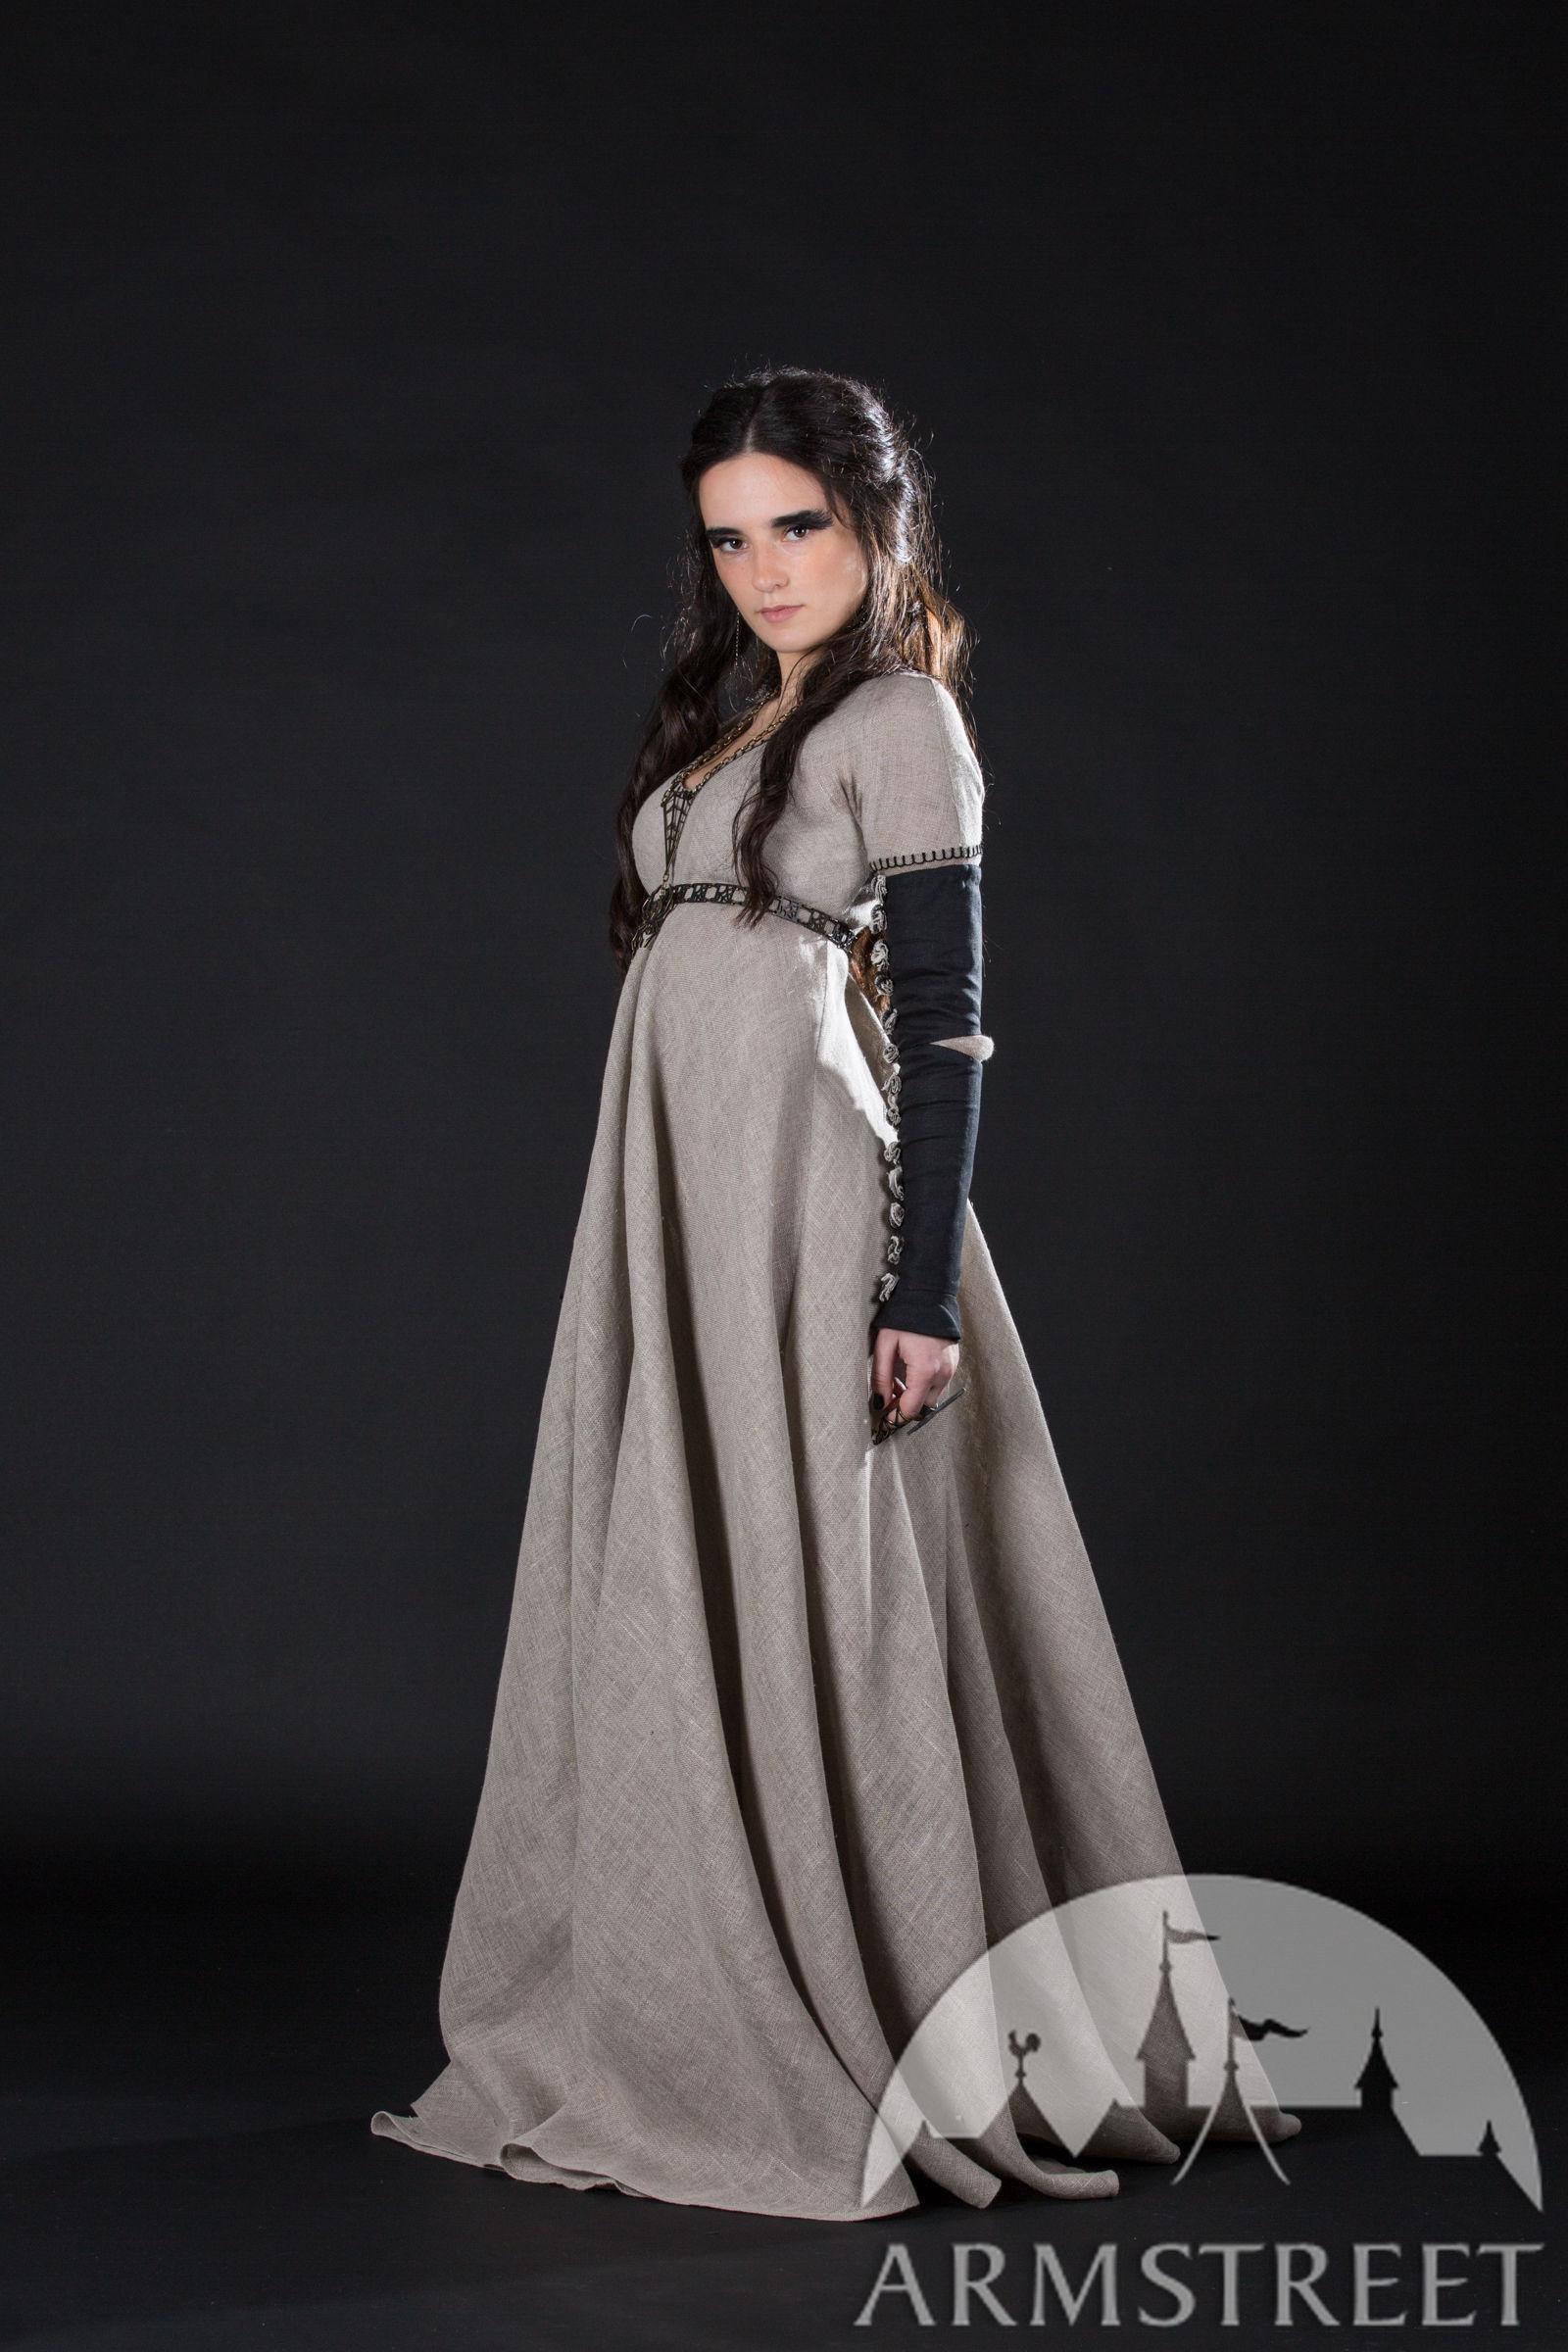 c8588294ebf Sackcloth dress with oversleeves